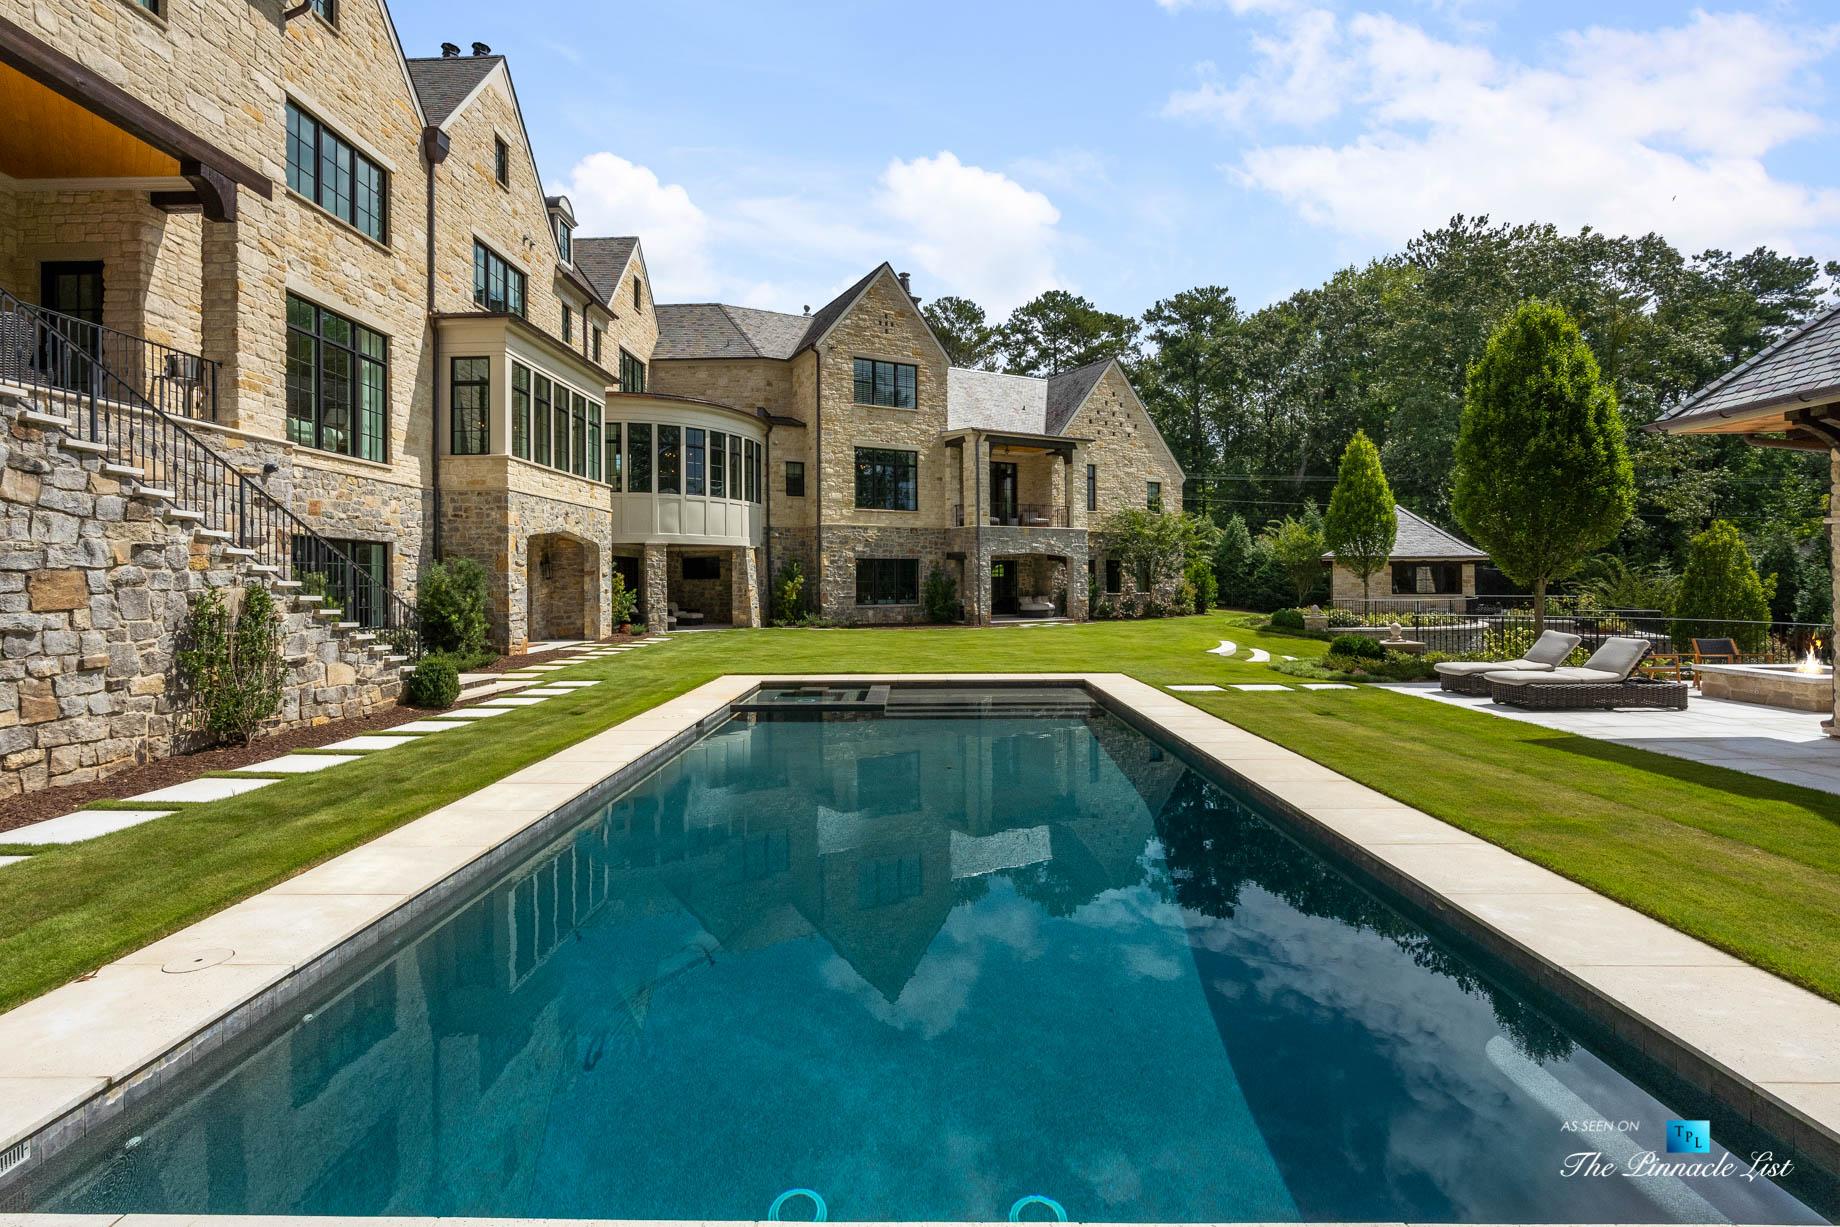 1150 W Garmon Rd, Atlanta, GA, USA - Backyard Pool - Luxury Real Estate - Buckhead Estate Home